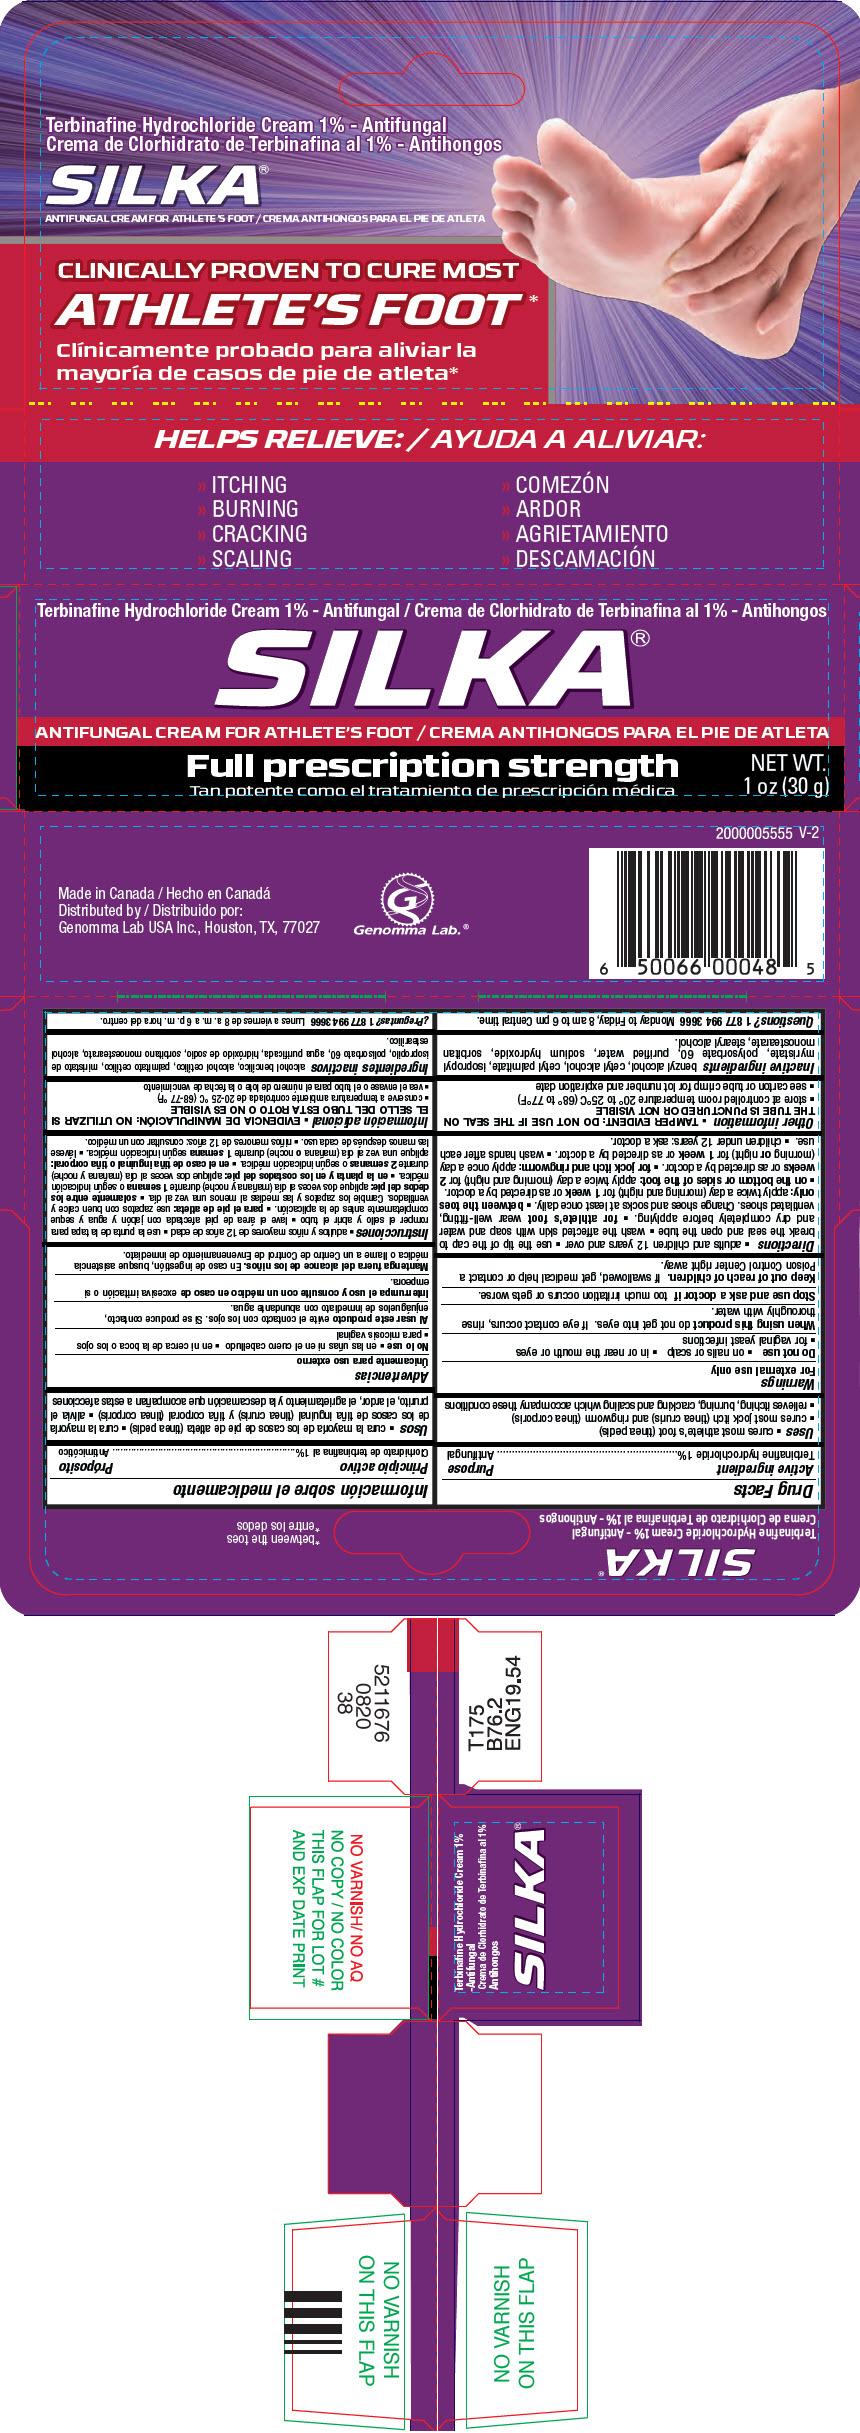 Silka Antifungal (Terbinafine Hydrochloride) Cream [Genomma Lab Usa, Inc.]